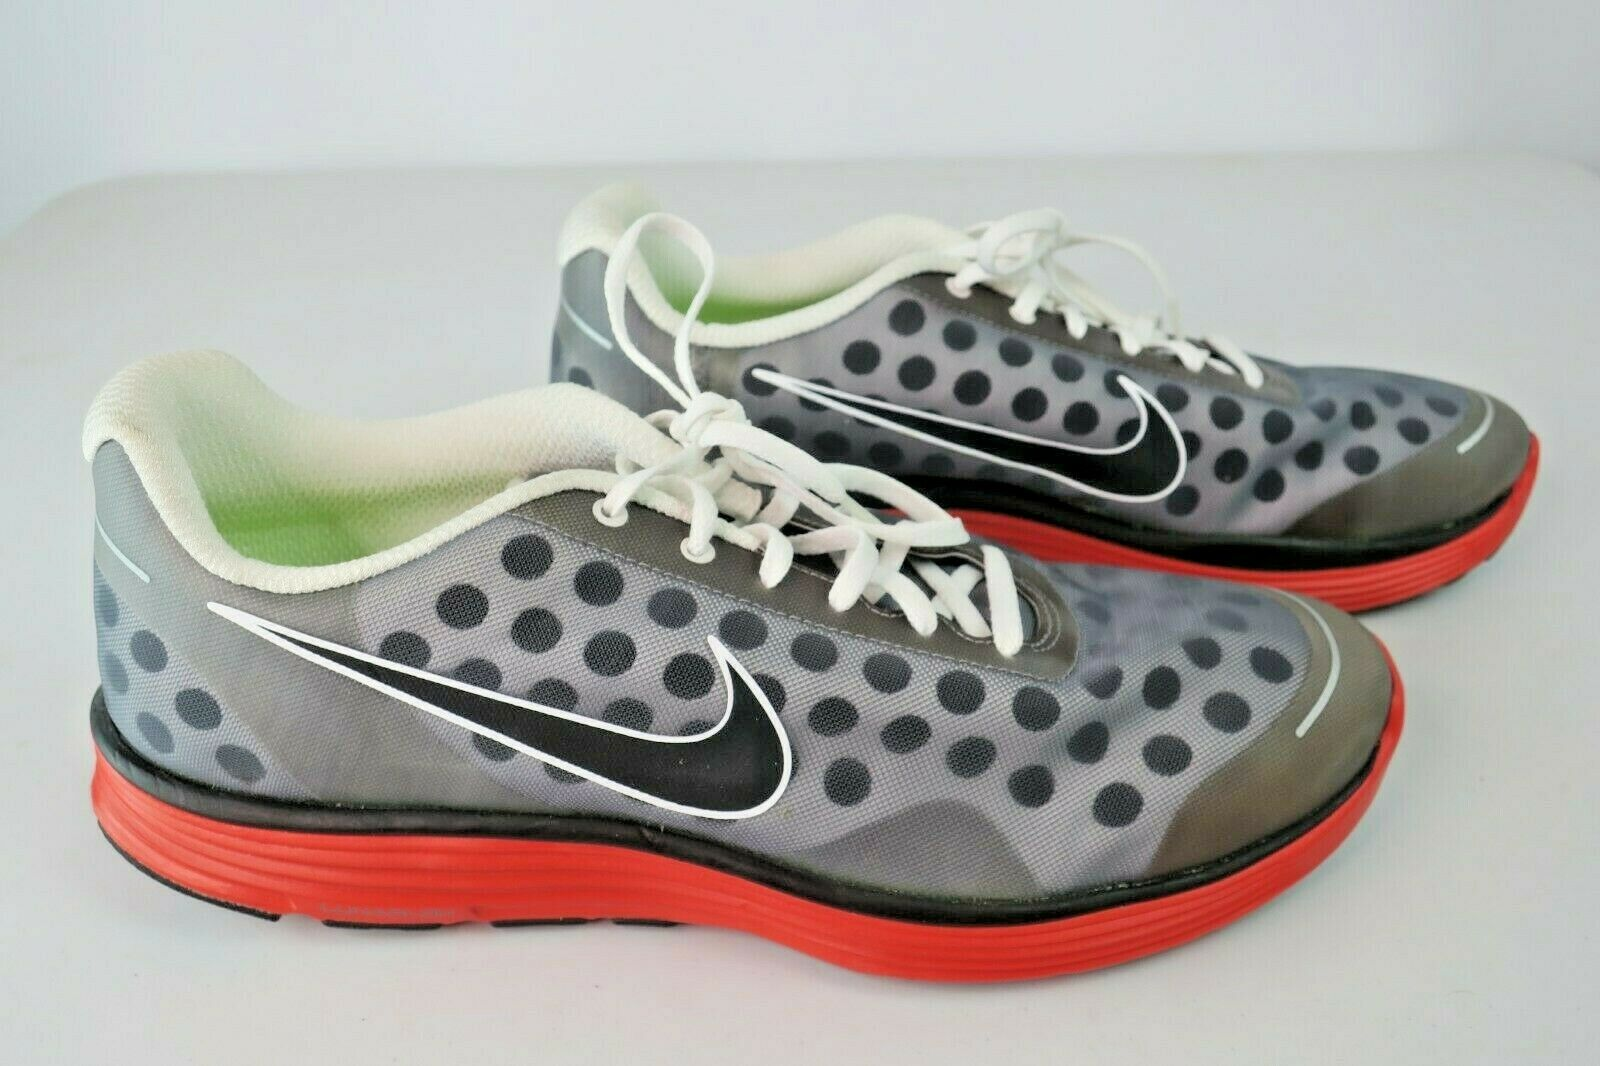 Nike Lunarswift+ 2 Men's Sneakers in Grey Red (443840-006) 13 M US MEN 2011 NWOB